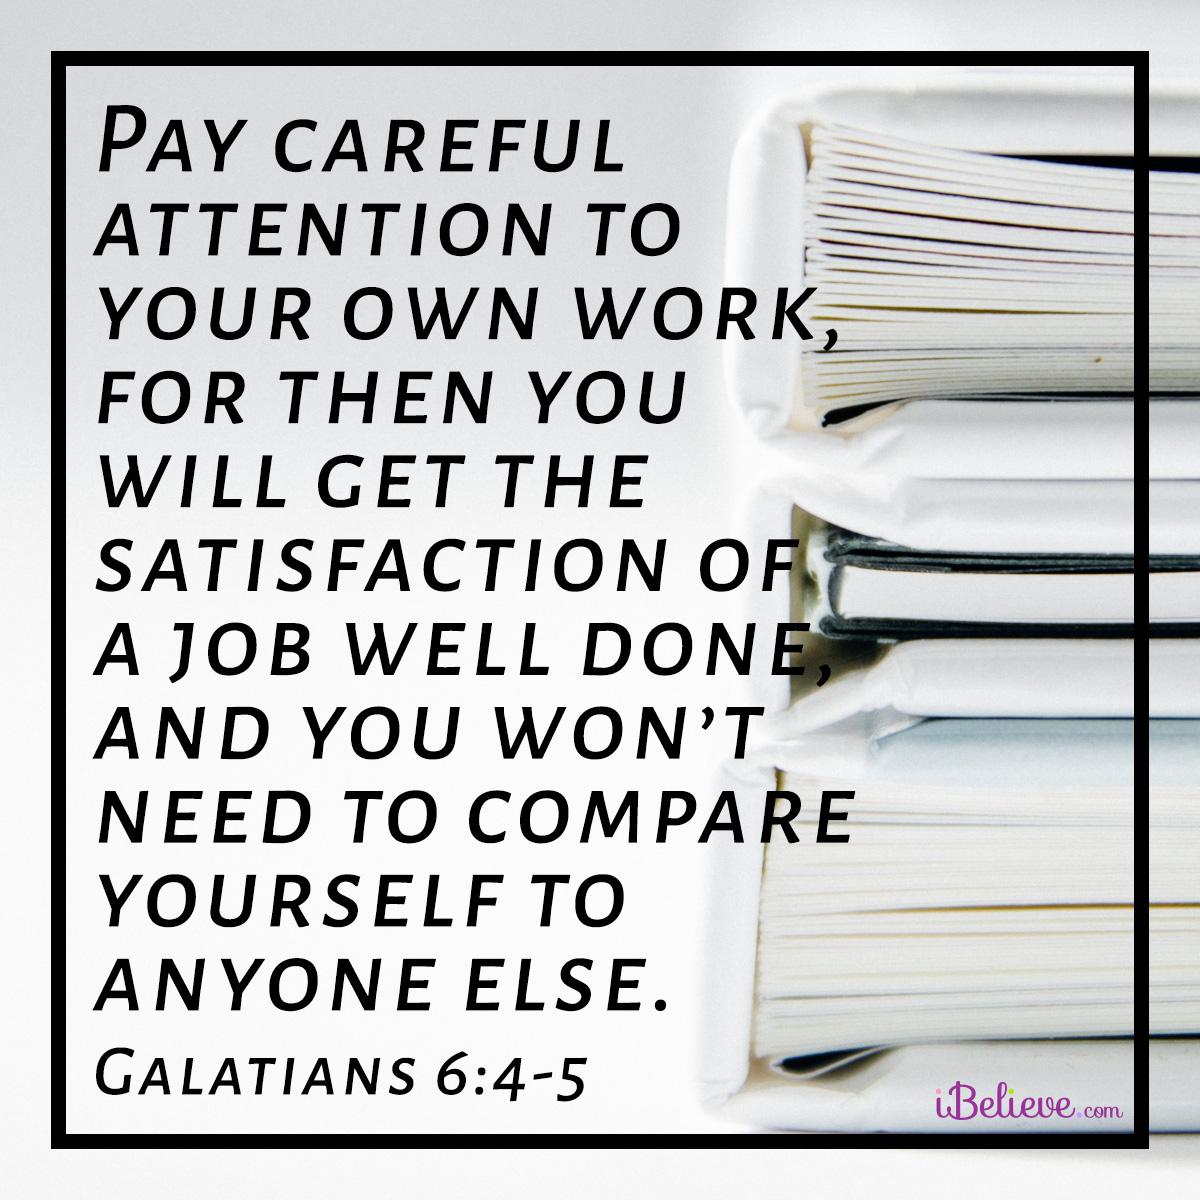 Galatians 6:4-5 square image